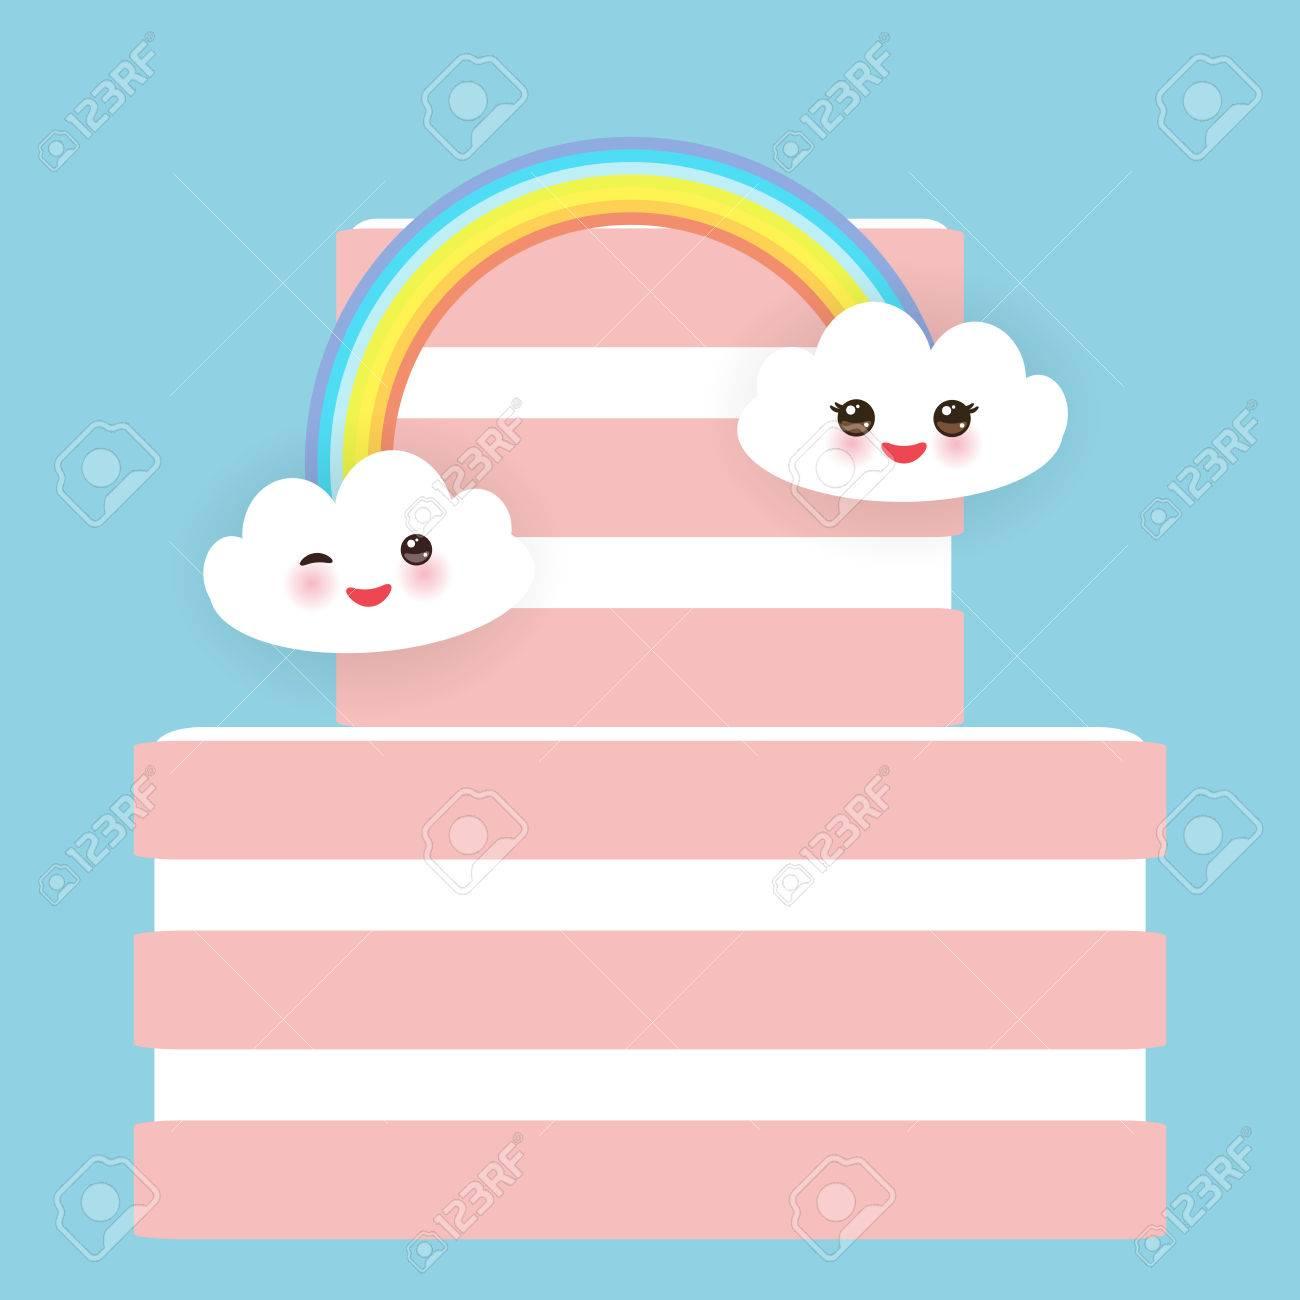 Kawaii Happy Birthday Sweet Strawberry Pink Cake White Cream Clouds Rainbow Banner